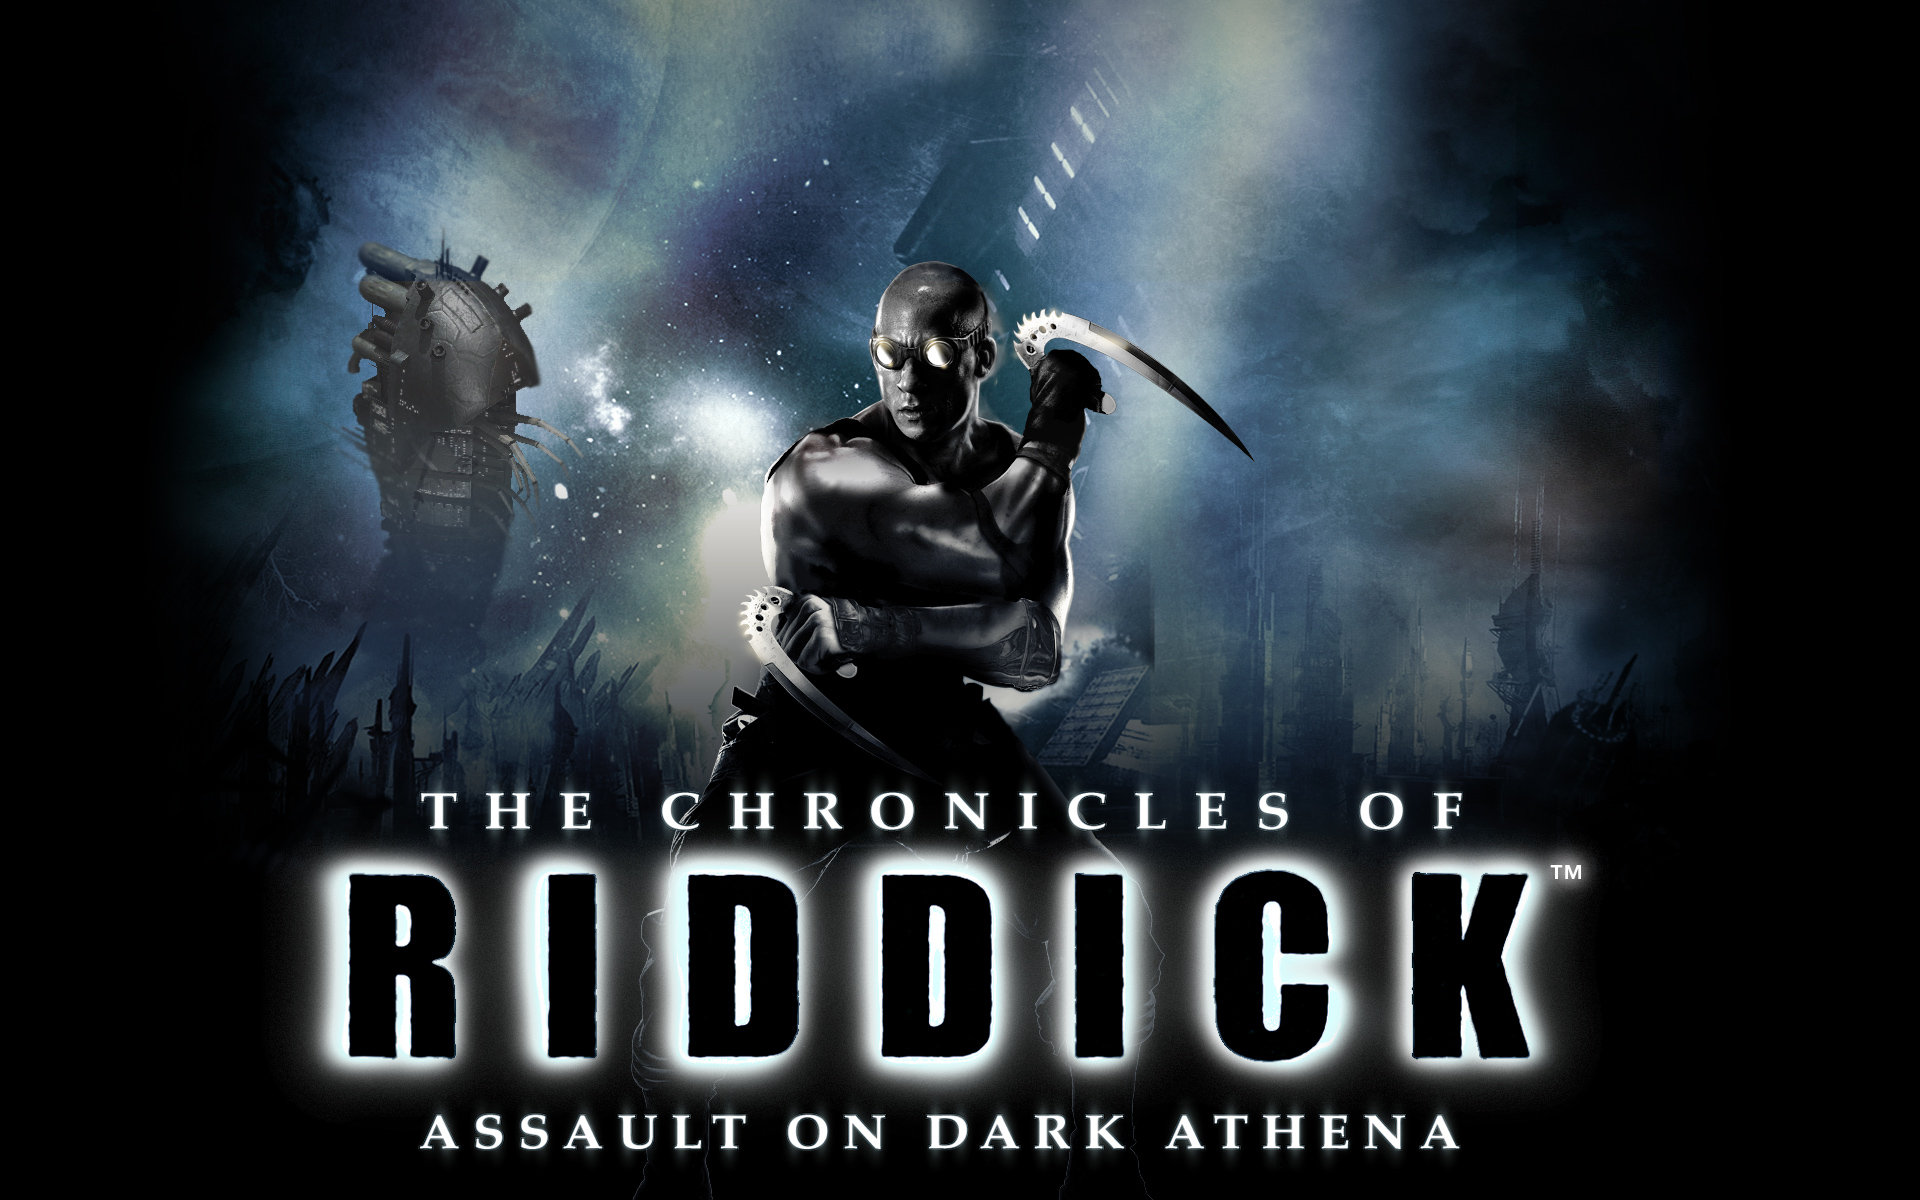 Assault on Dark Athena